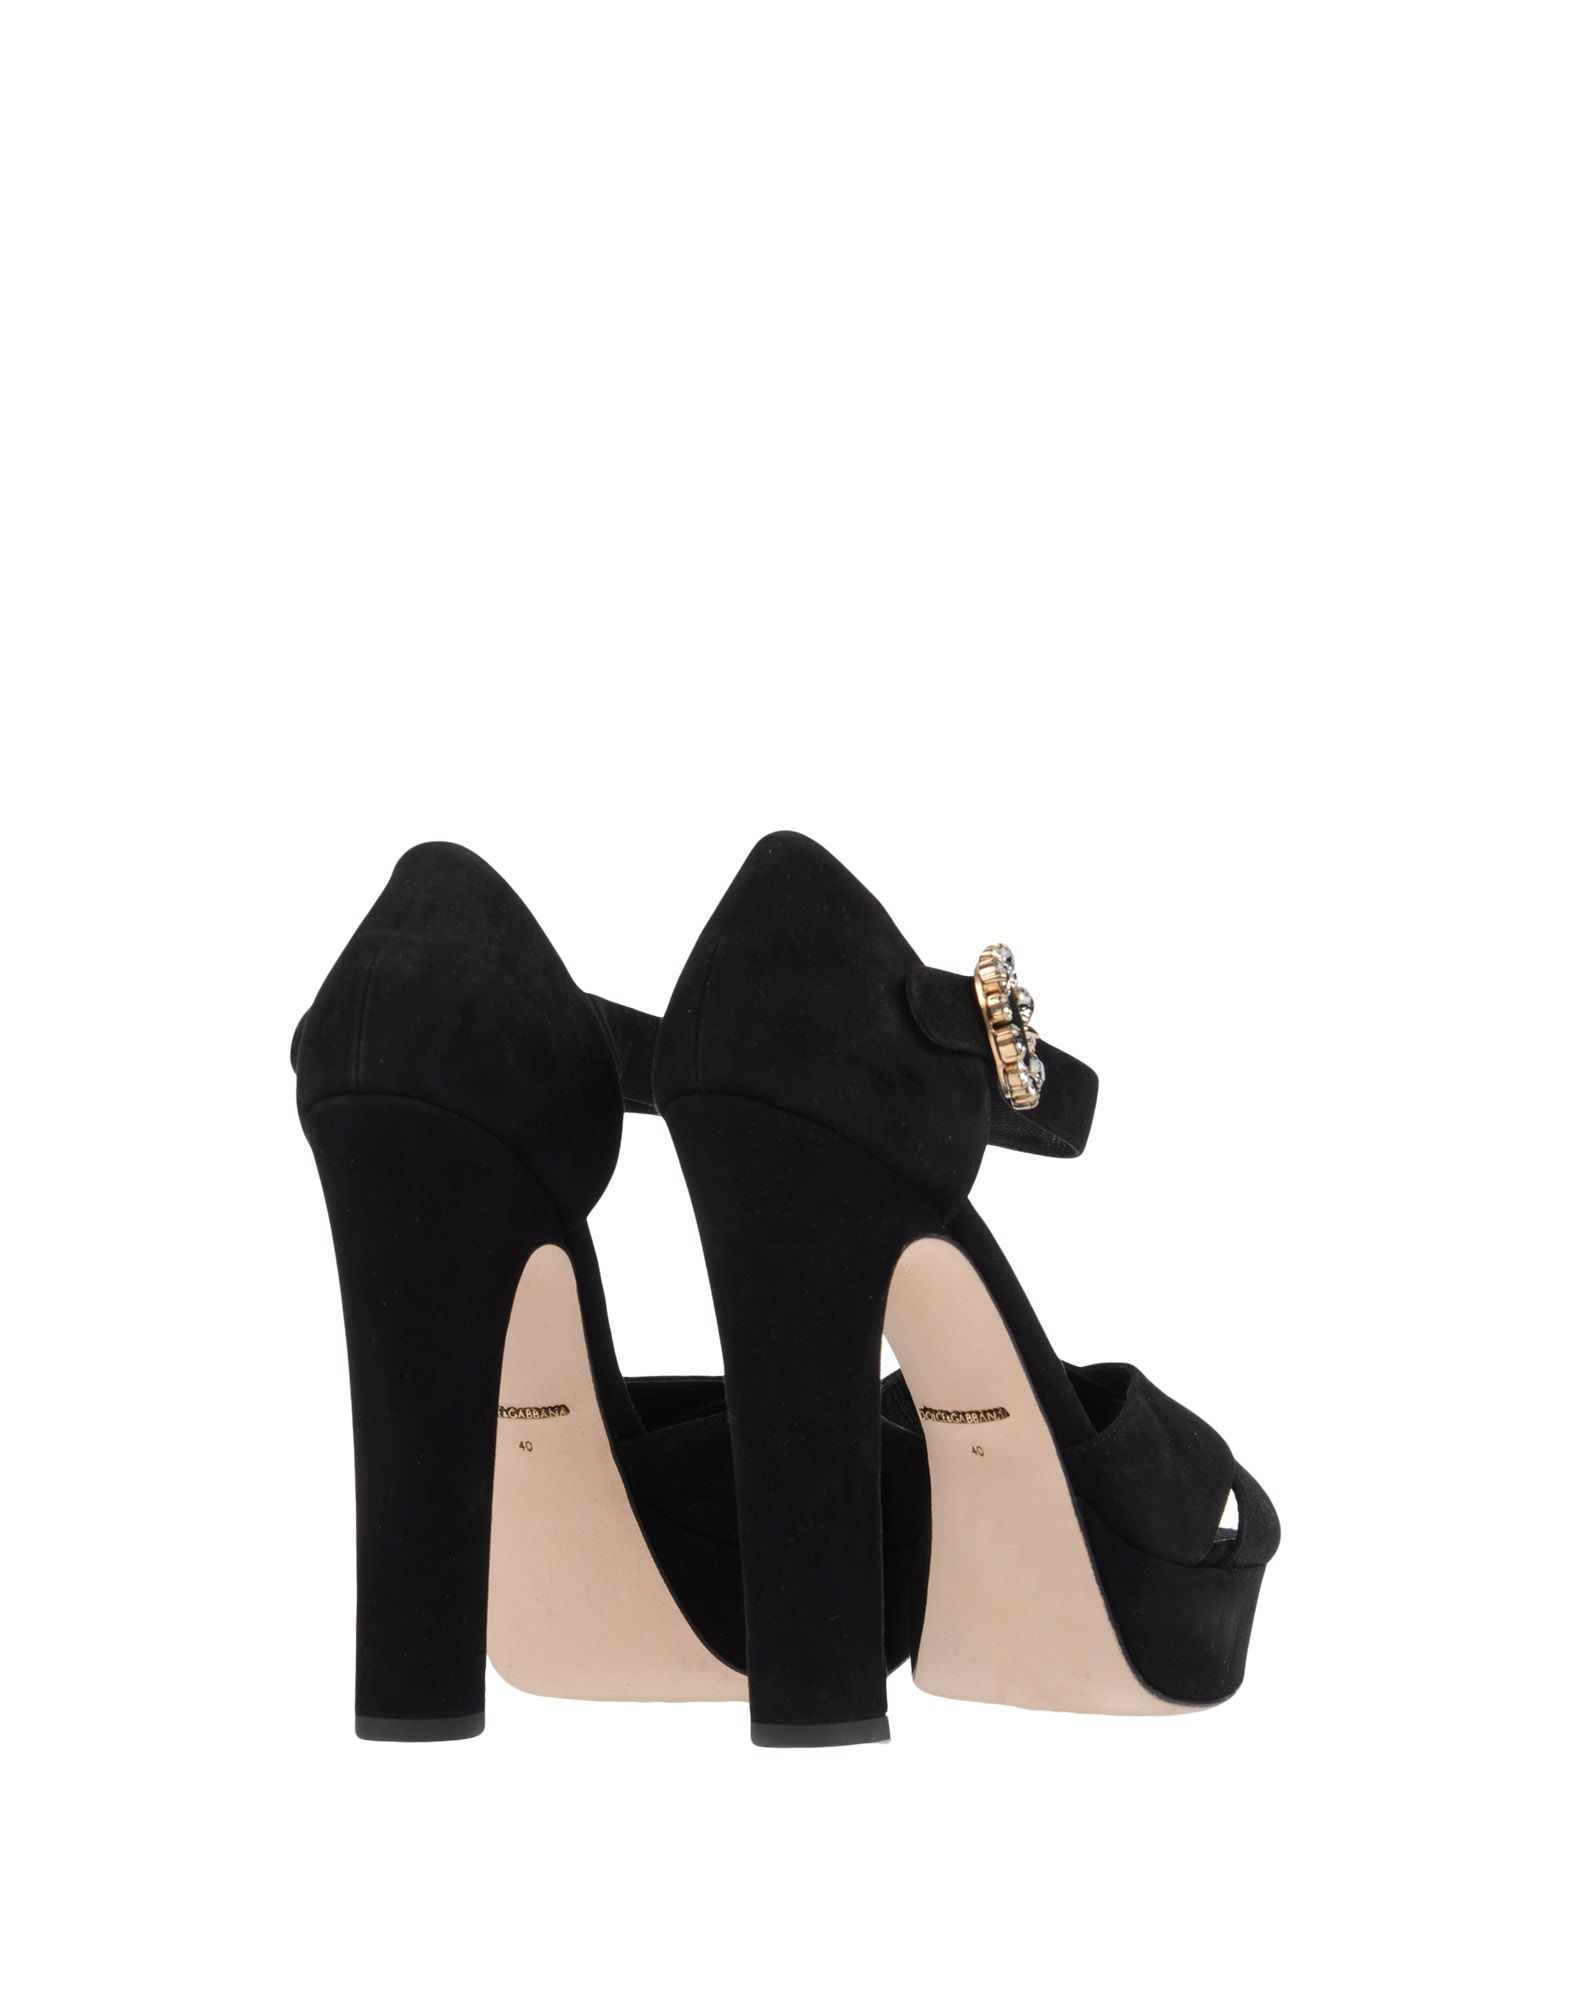 Dolce & Gabbana Sandalen Damen Damen Damen  11242822HL Neue Schuhe 8e4b2f